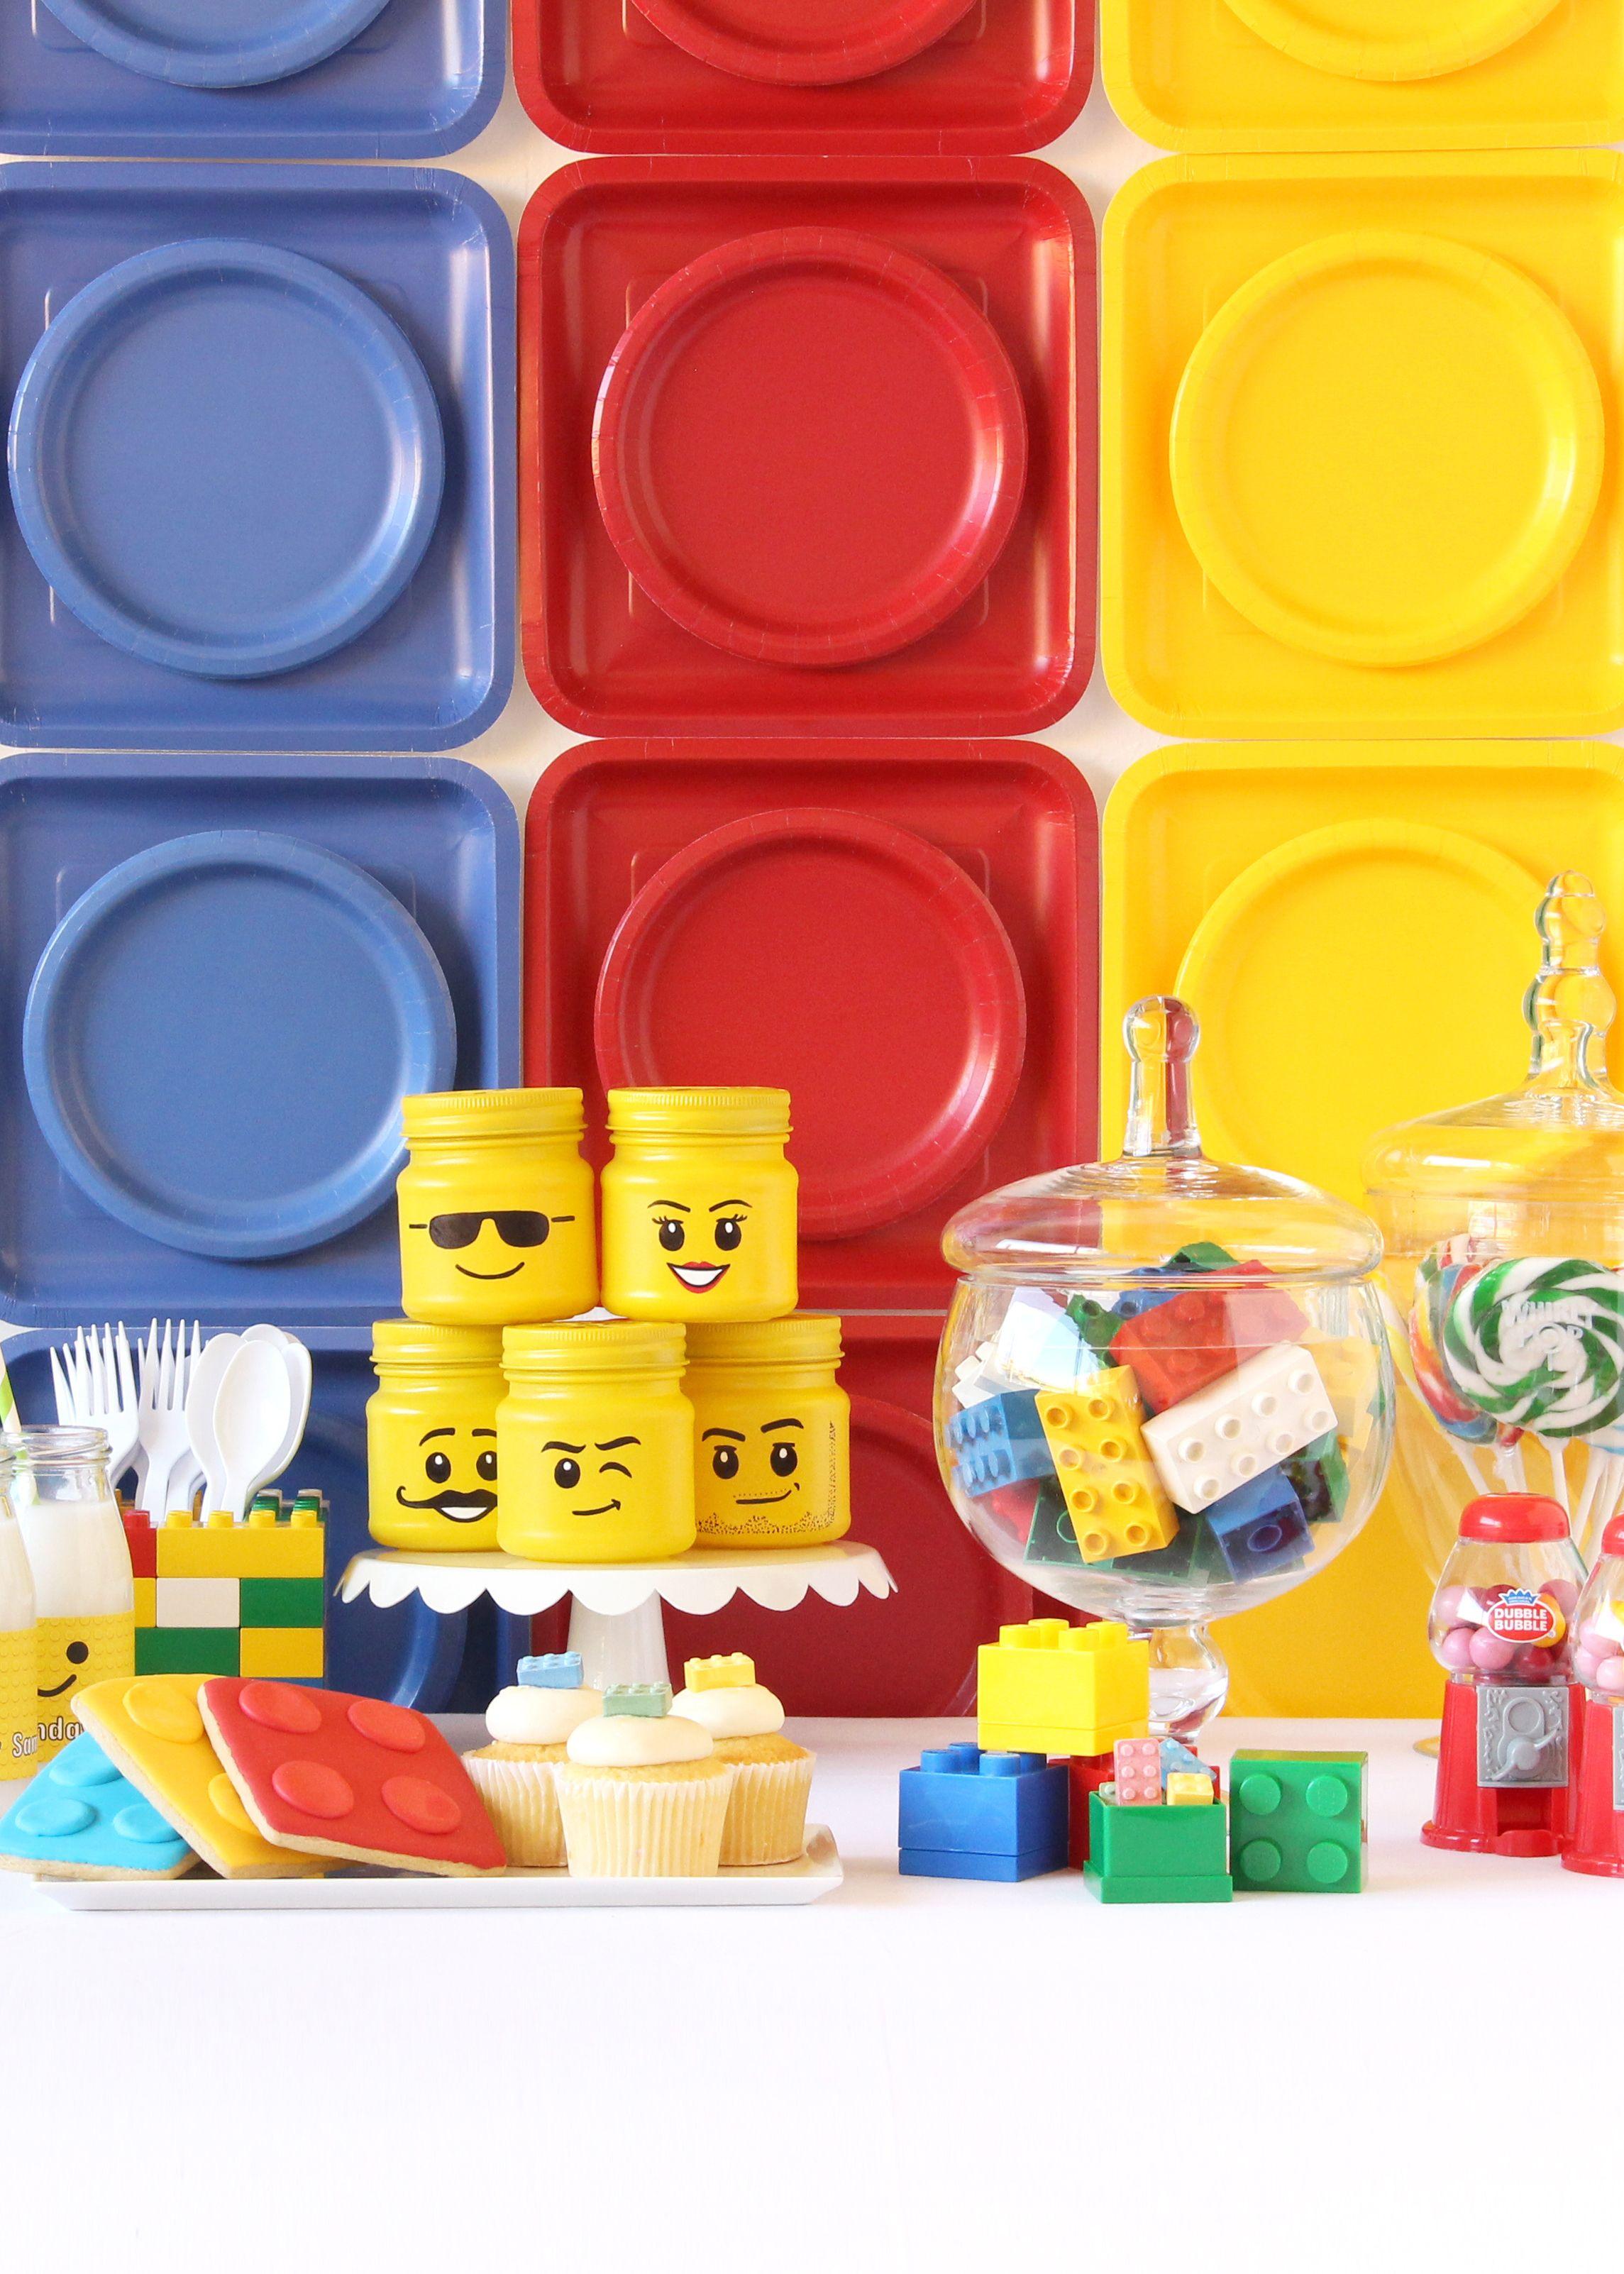 Kids Birthday Lego Party Birthday Party Themes Lego Themed Party